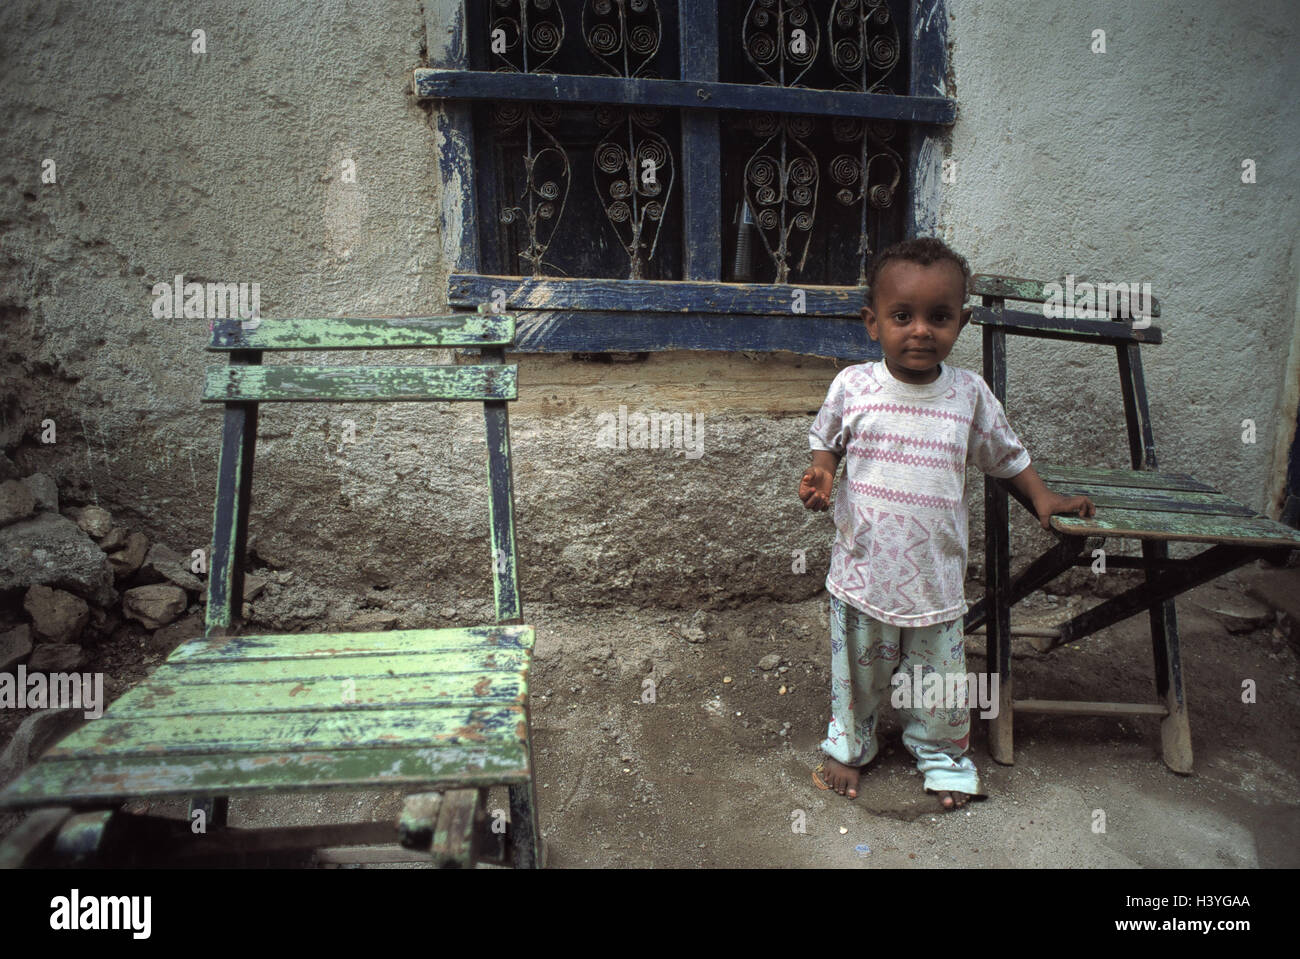 Eritrea, Massawa, House, Child, Chairs, Africa, North, Africa,  Nordostafrika, Republic, Massaua, Mitsiwa, Port, Residential House, Old,  Detail, Outside Wall ...